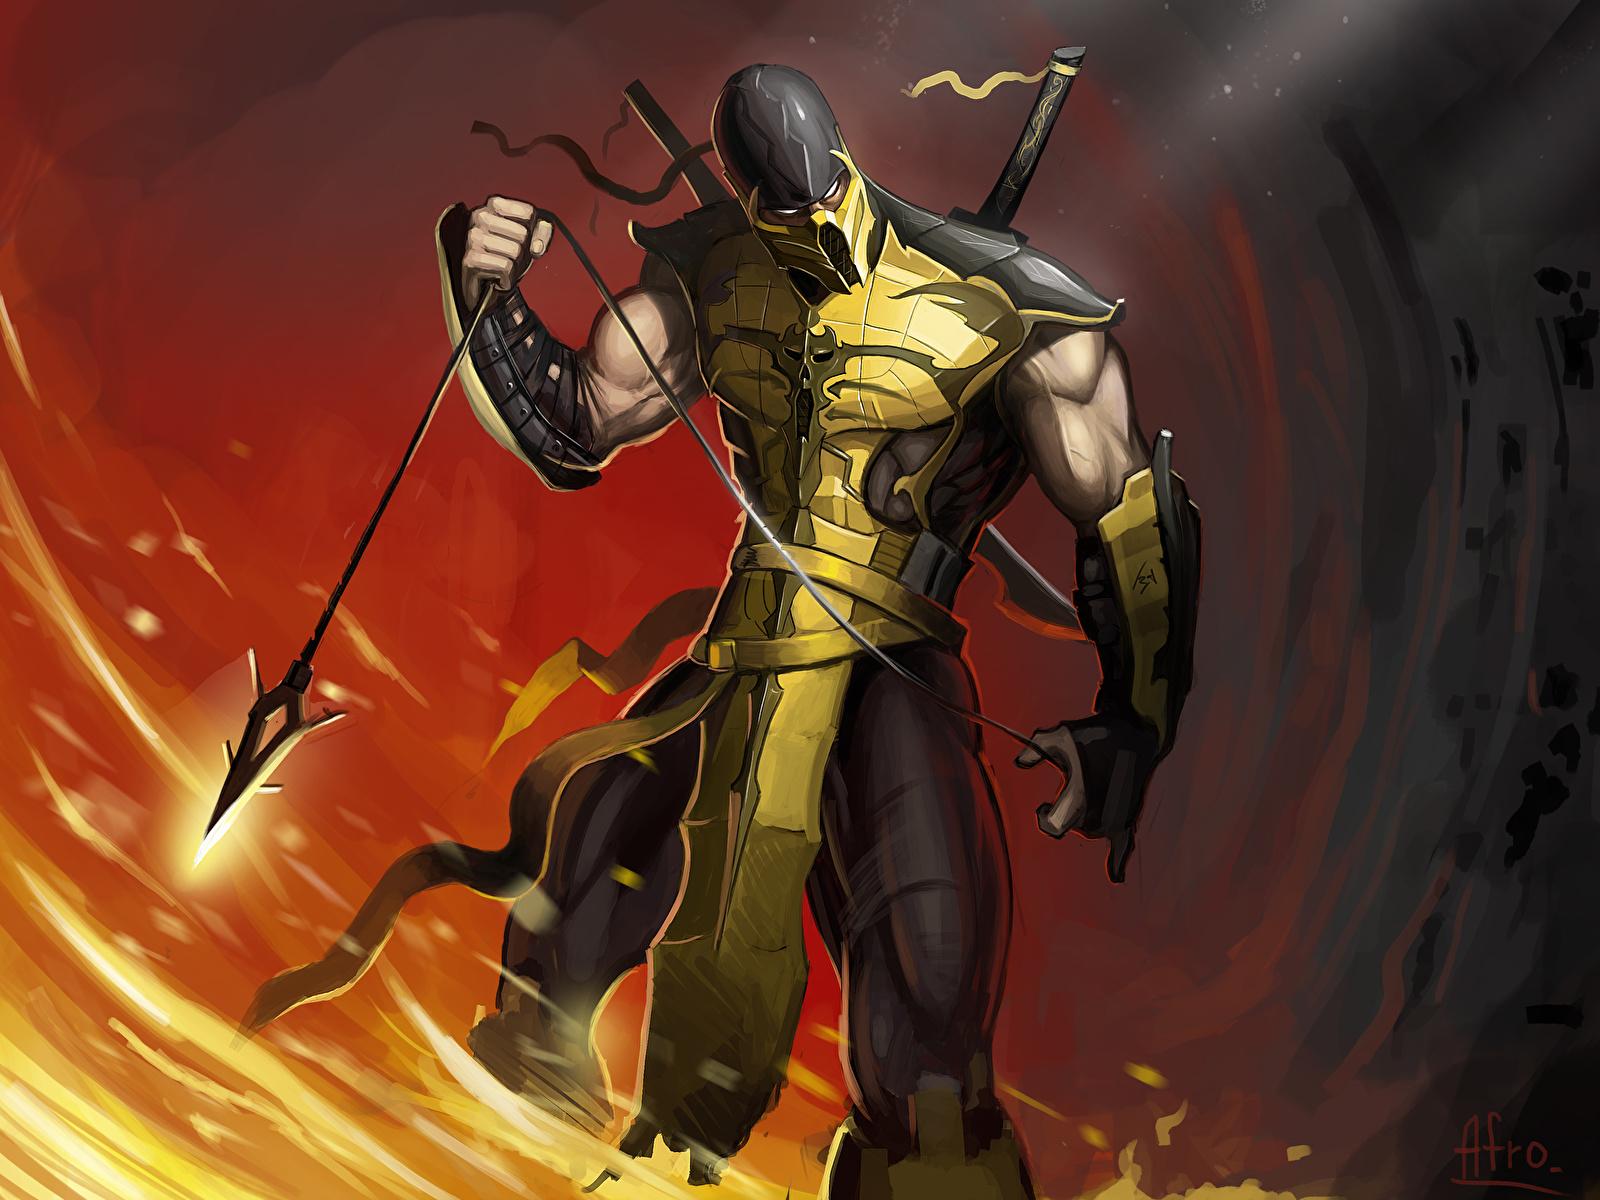 Picture Mortal Kombat Ninja Warrior Scorpion Fantasy Vdeo